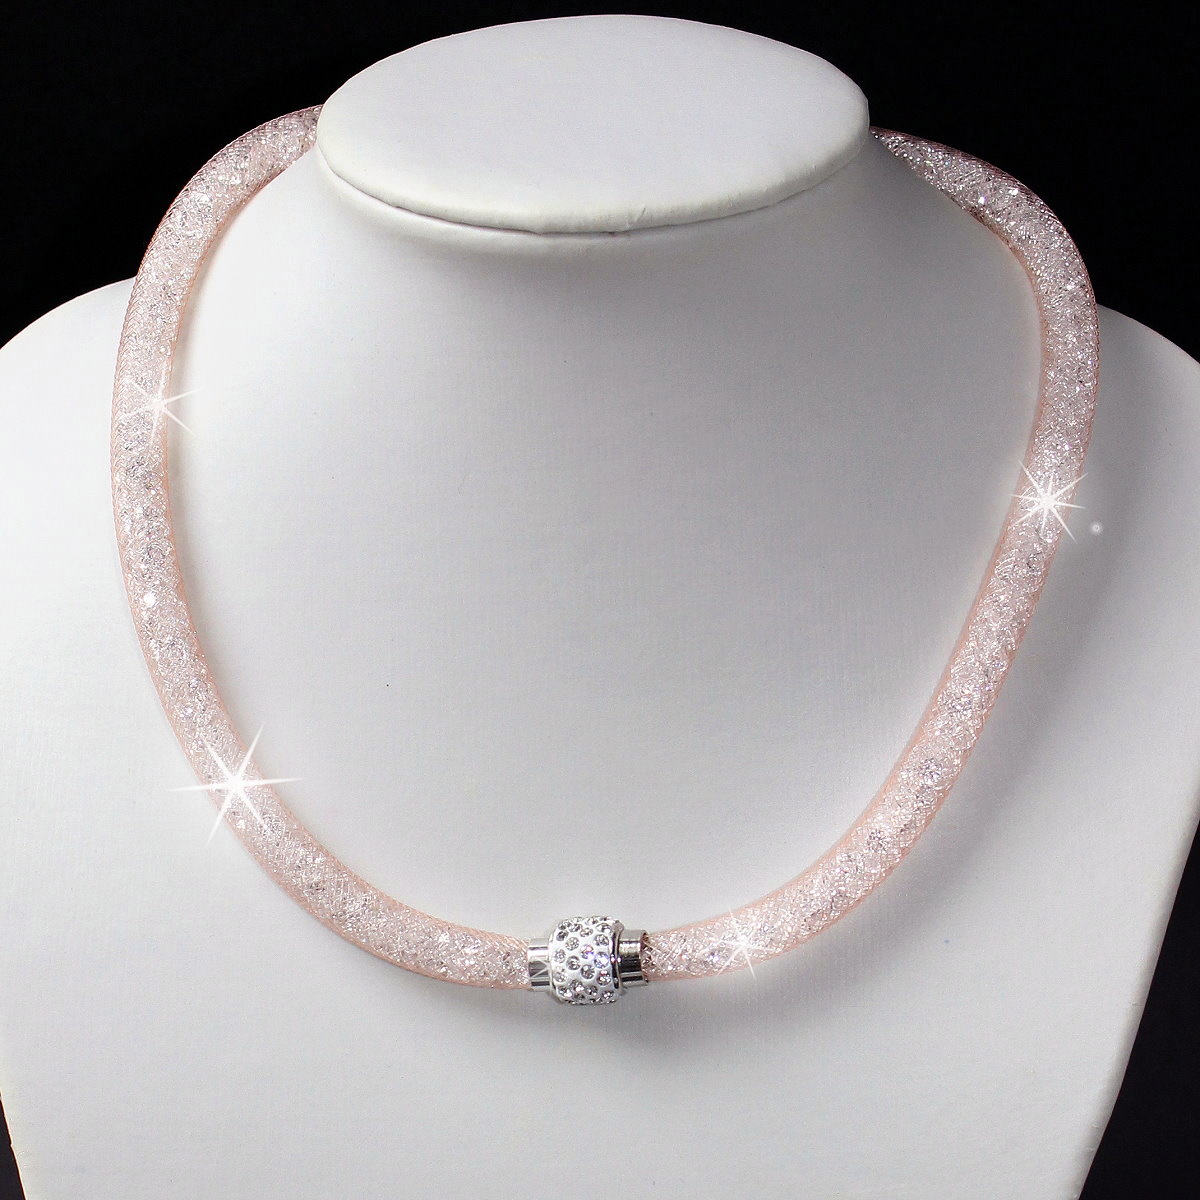 K1439 Collier Kristalle in Nylonnetzschlauch Shamballa Star rosé (K1022)